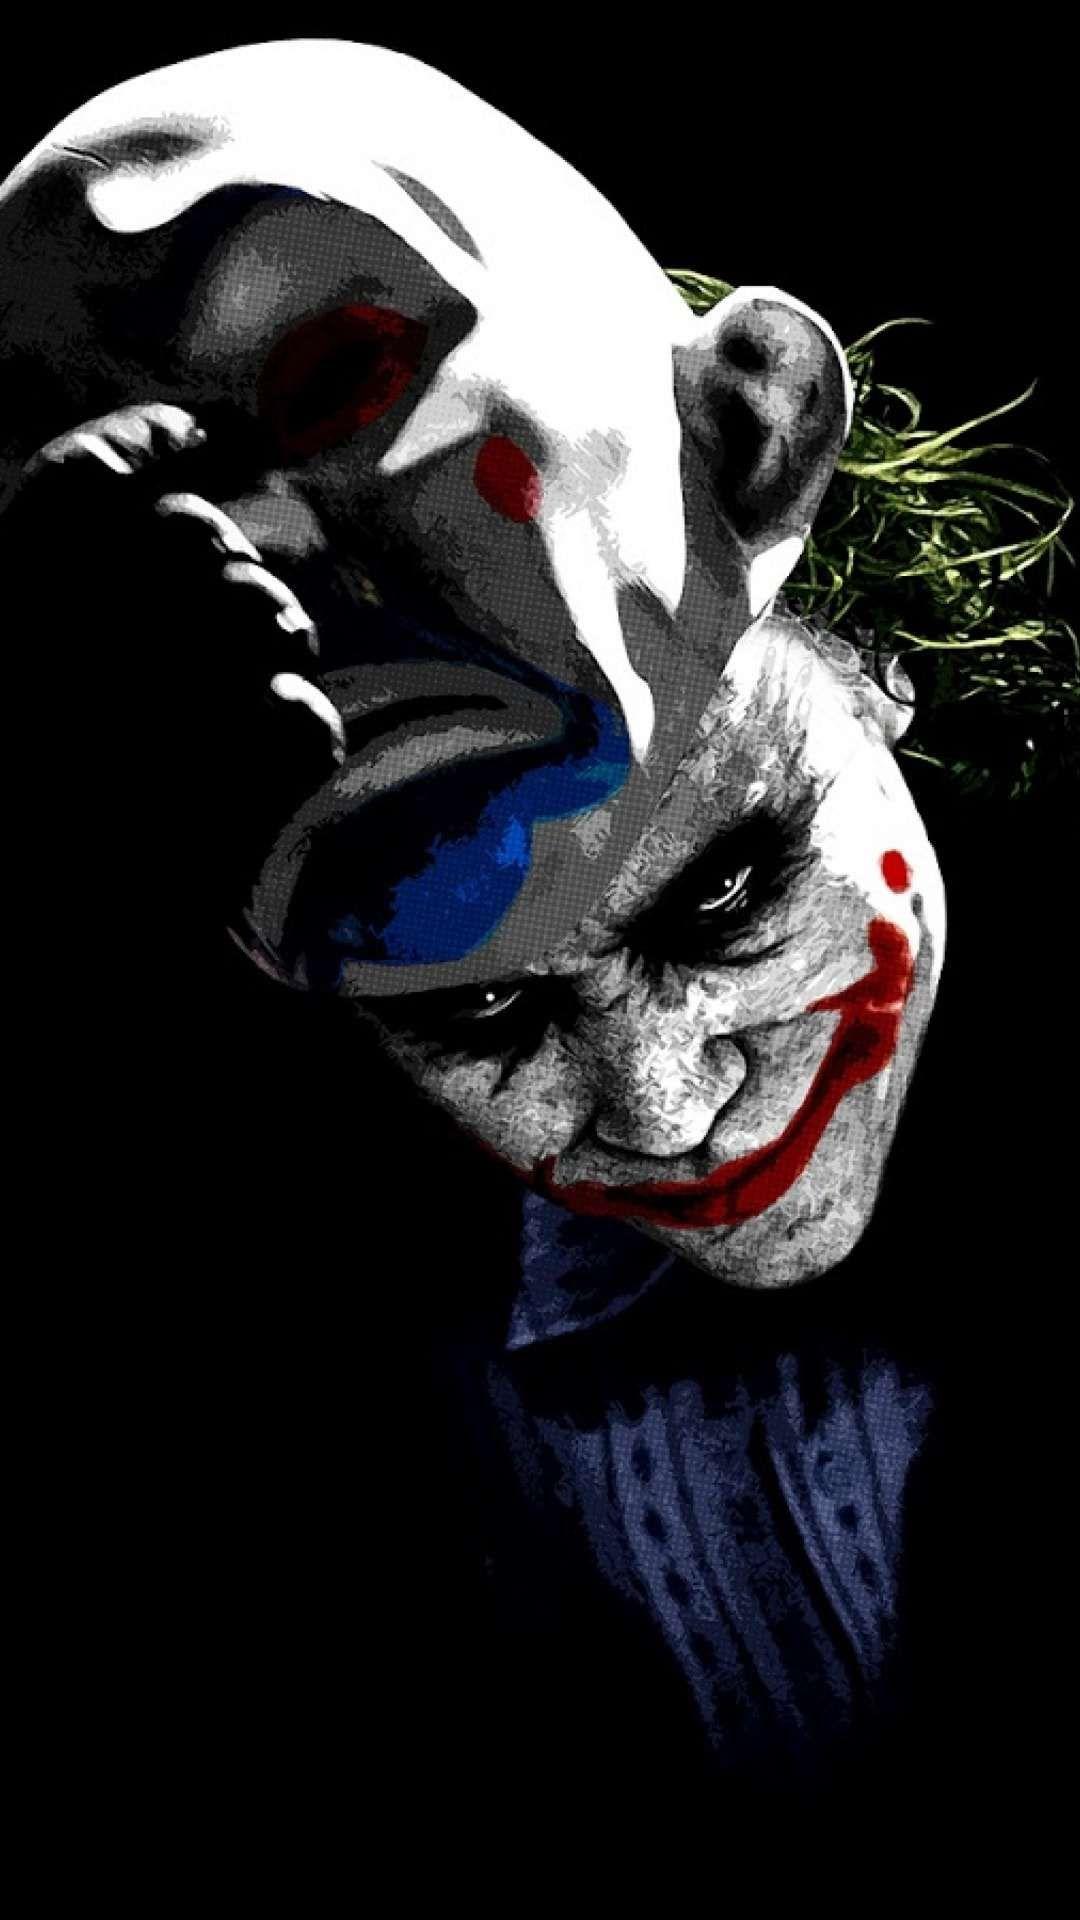 The Joker And Mask Wallpaper Joker Iphone Wallpaper Batman Joker Wallpaper Joker Artwork